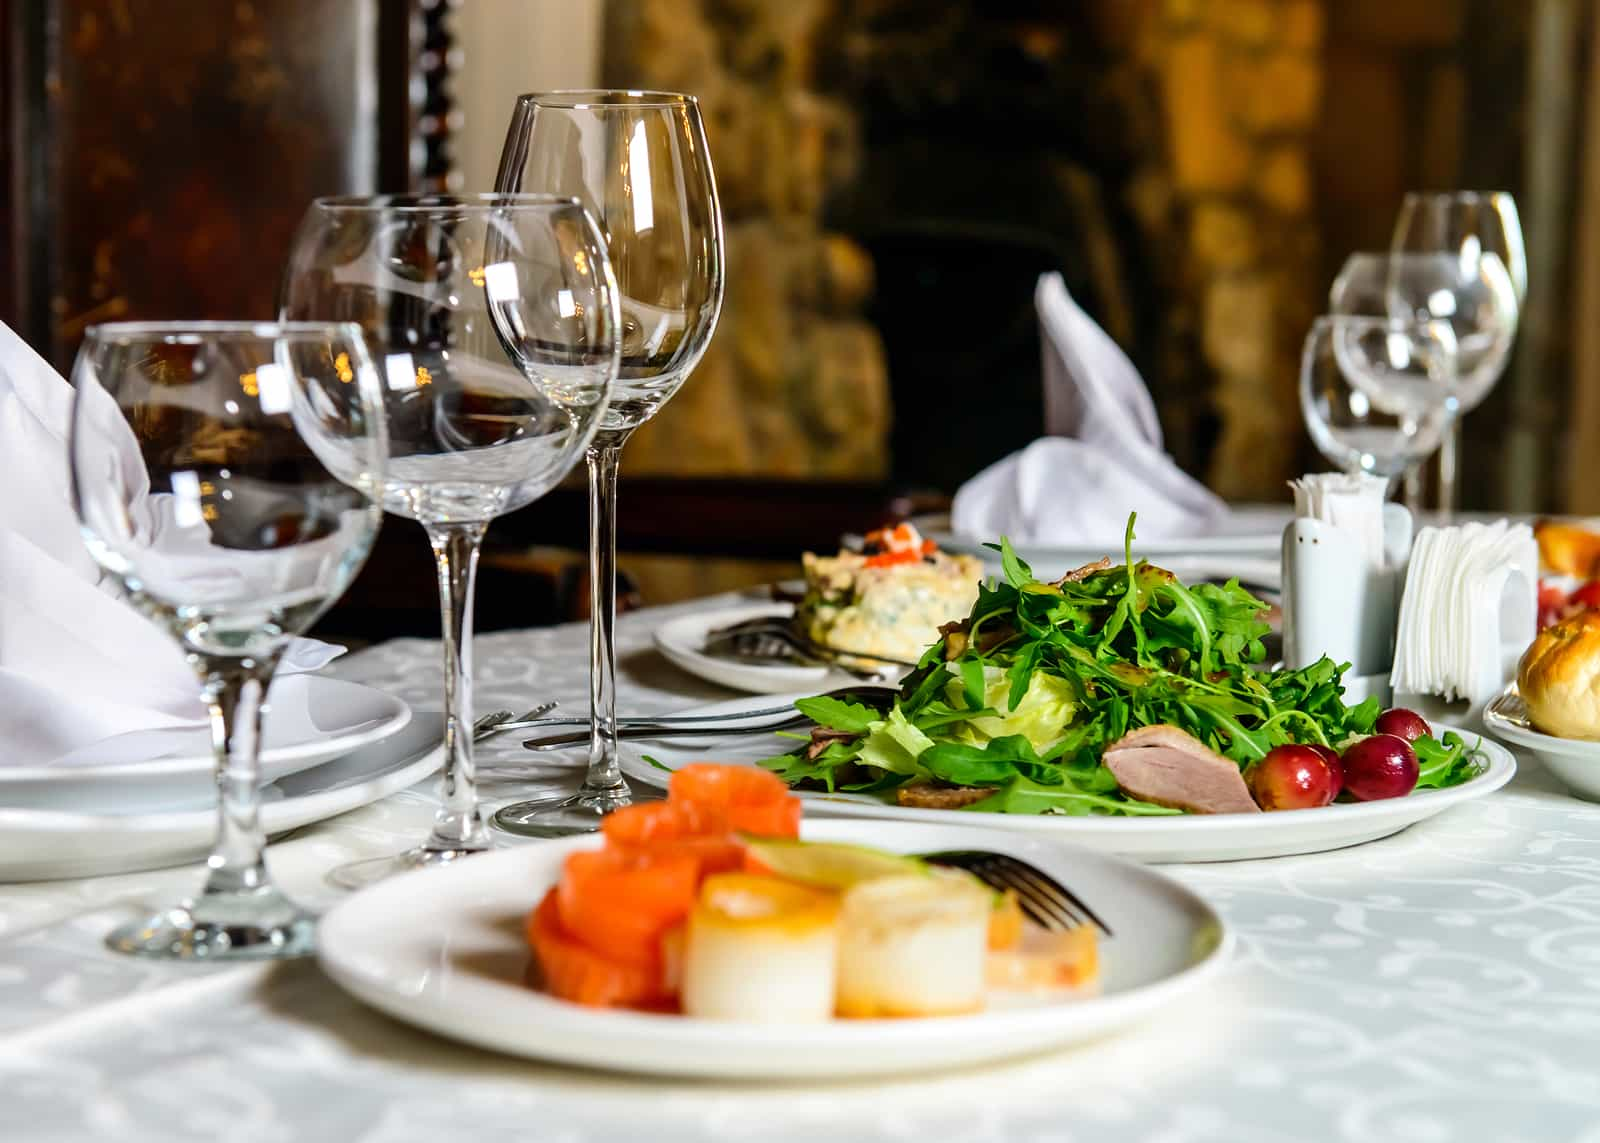 Served banquet restaurant table